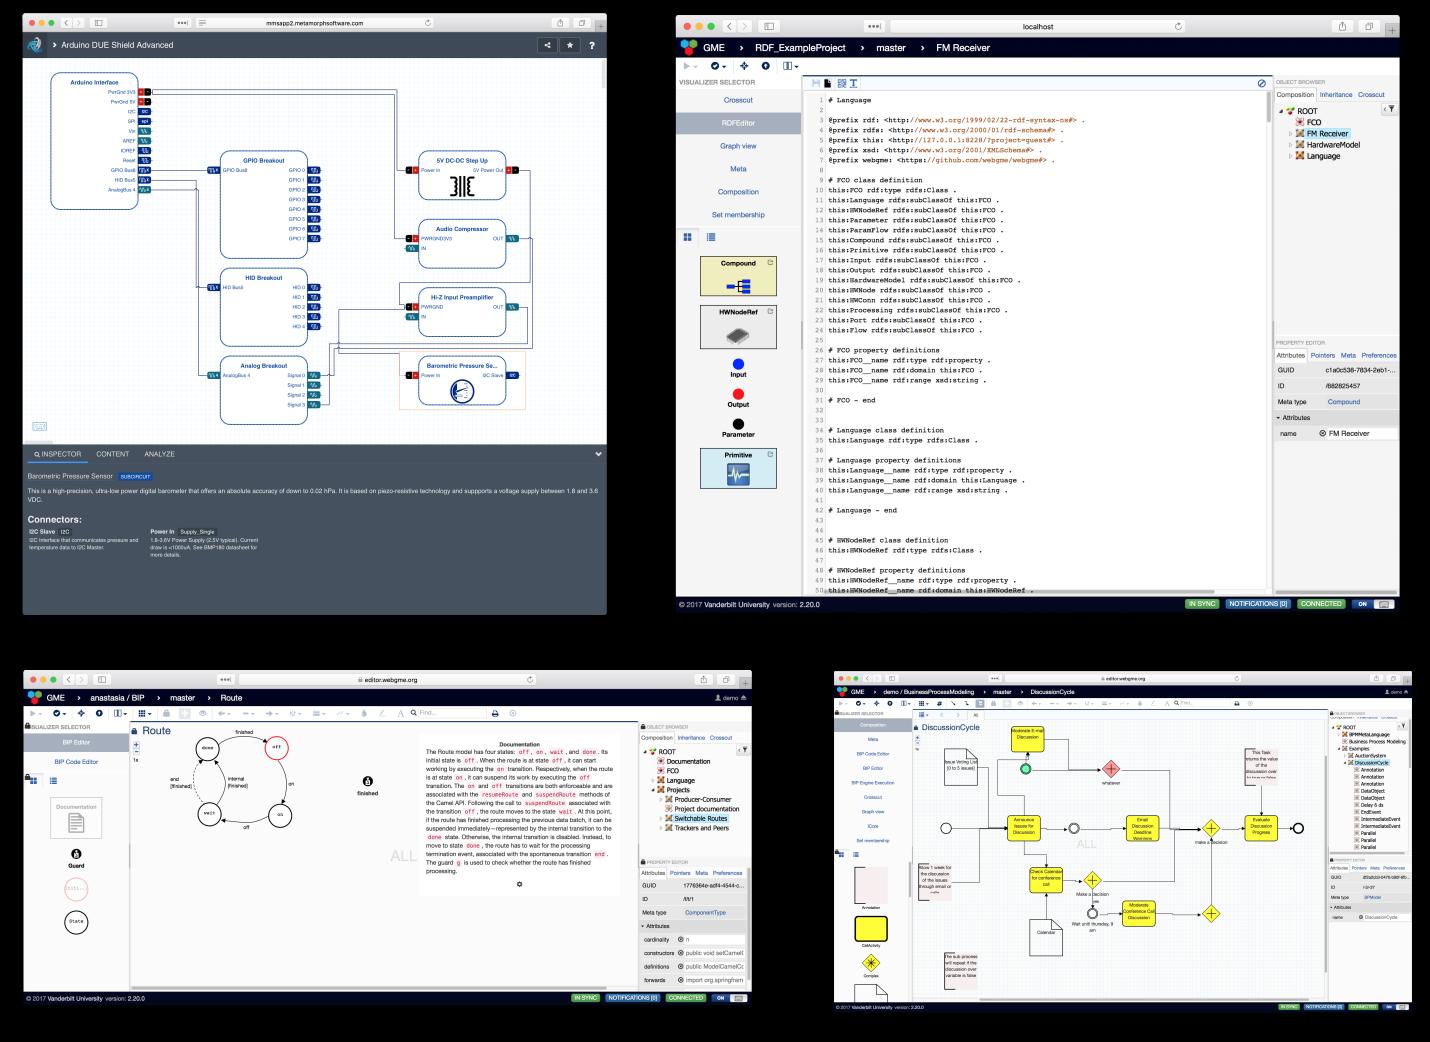 Four webgme-based applications. clockwise, from top left: metamorphosys circuit designer (metamorph), live rdf editor (metamorph, vanderbilt), business process modeling language (vanderbilt), bip (vanderbilt)